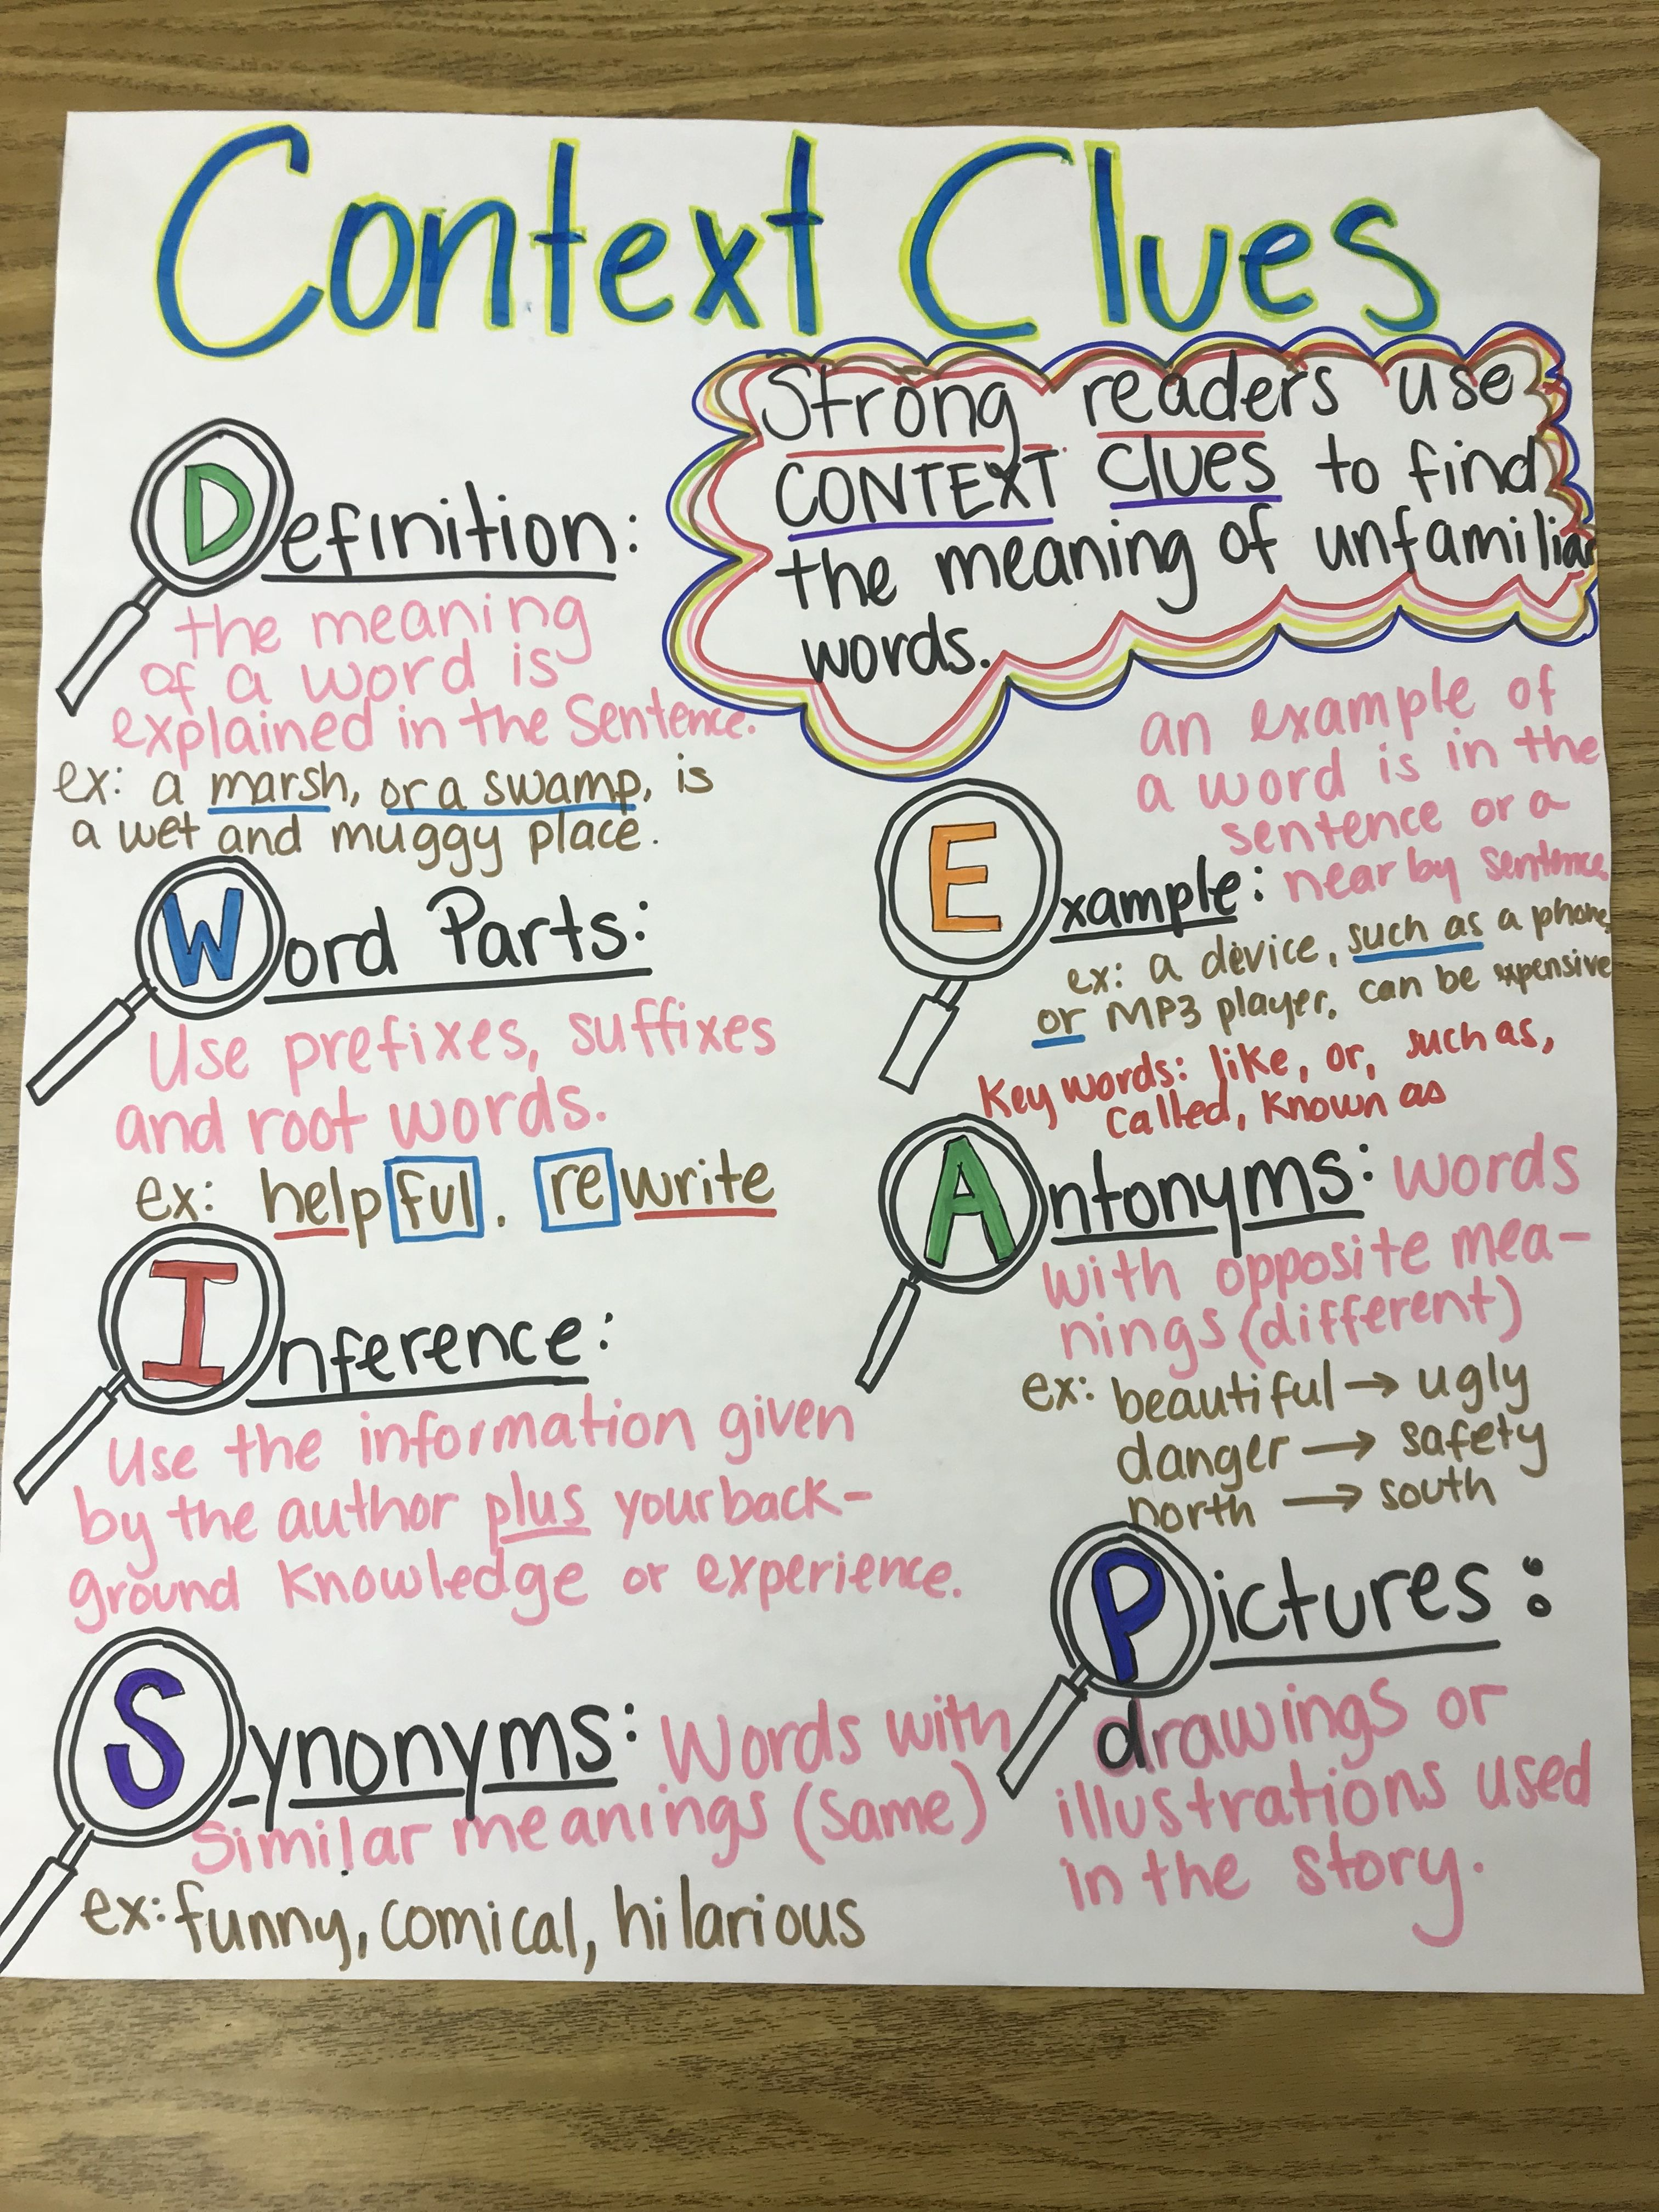 Context clues anchor chart | Context clues anchor chart ...